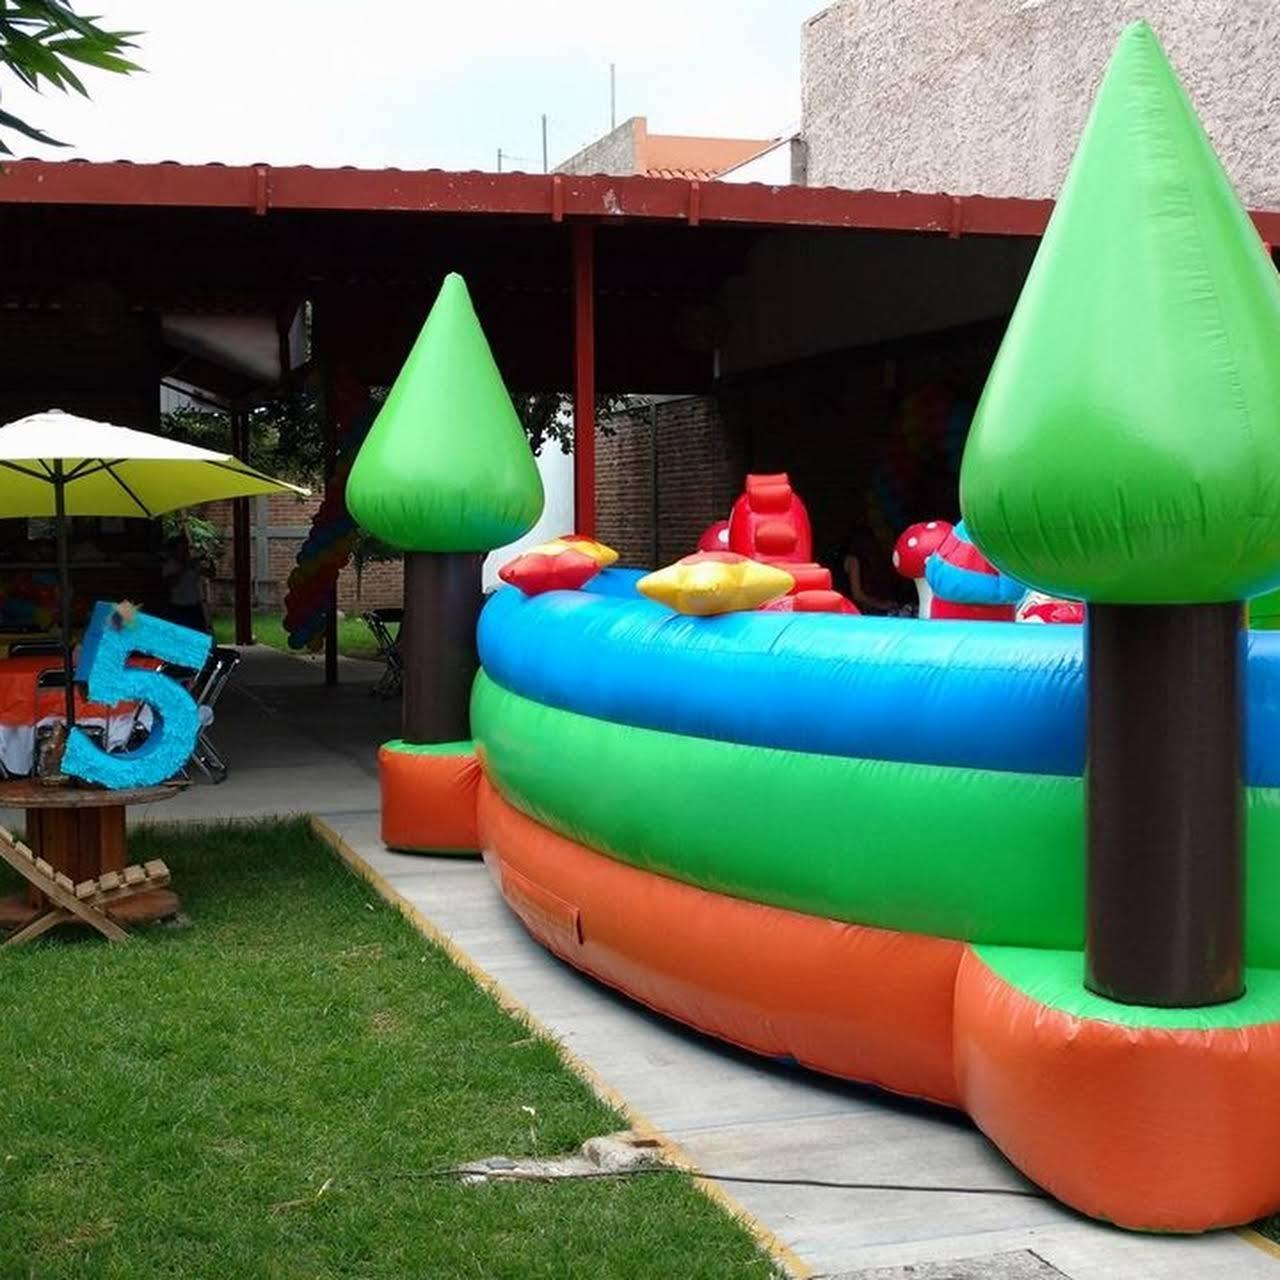 Terrazas Pequenas Para Fiestas Infantiles En Zapopan Ideas De Nuevo Diseno